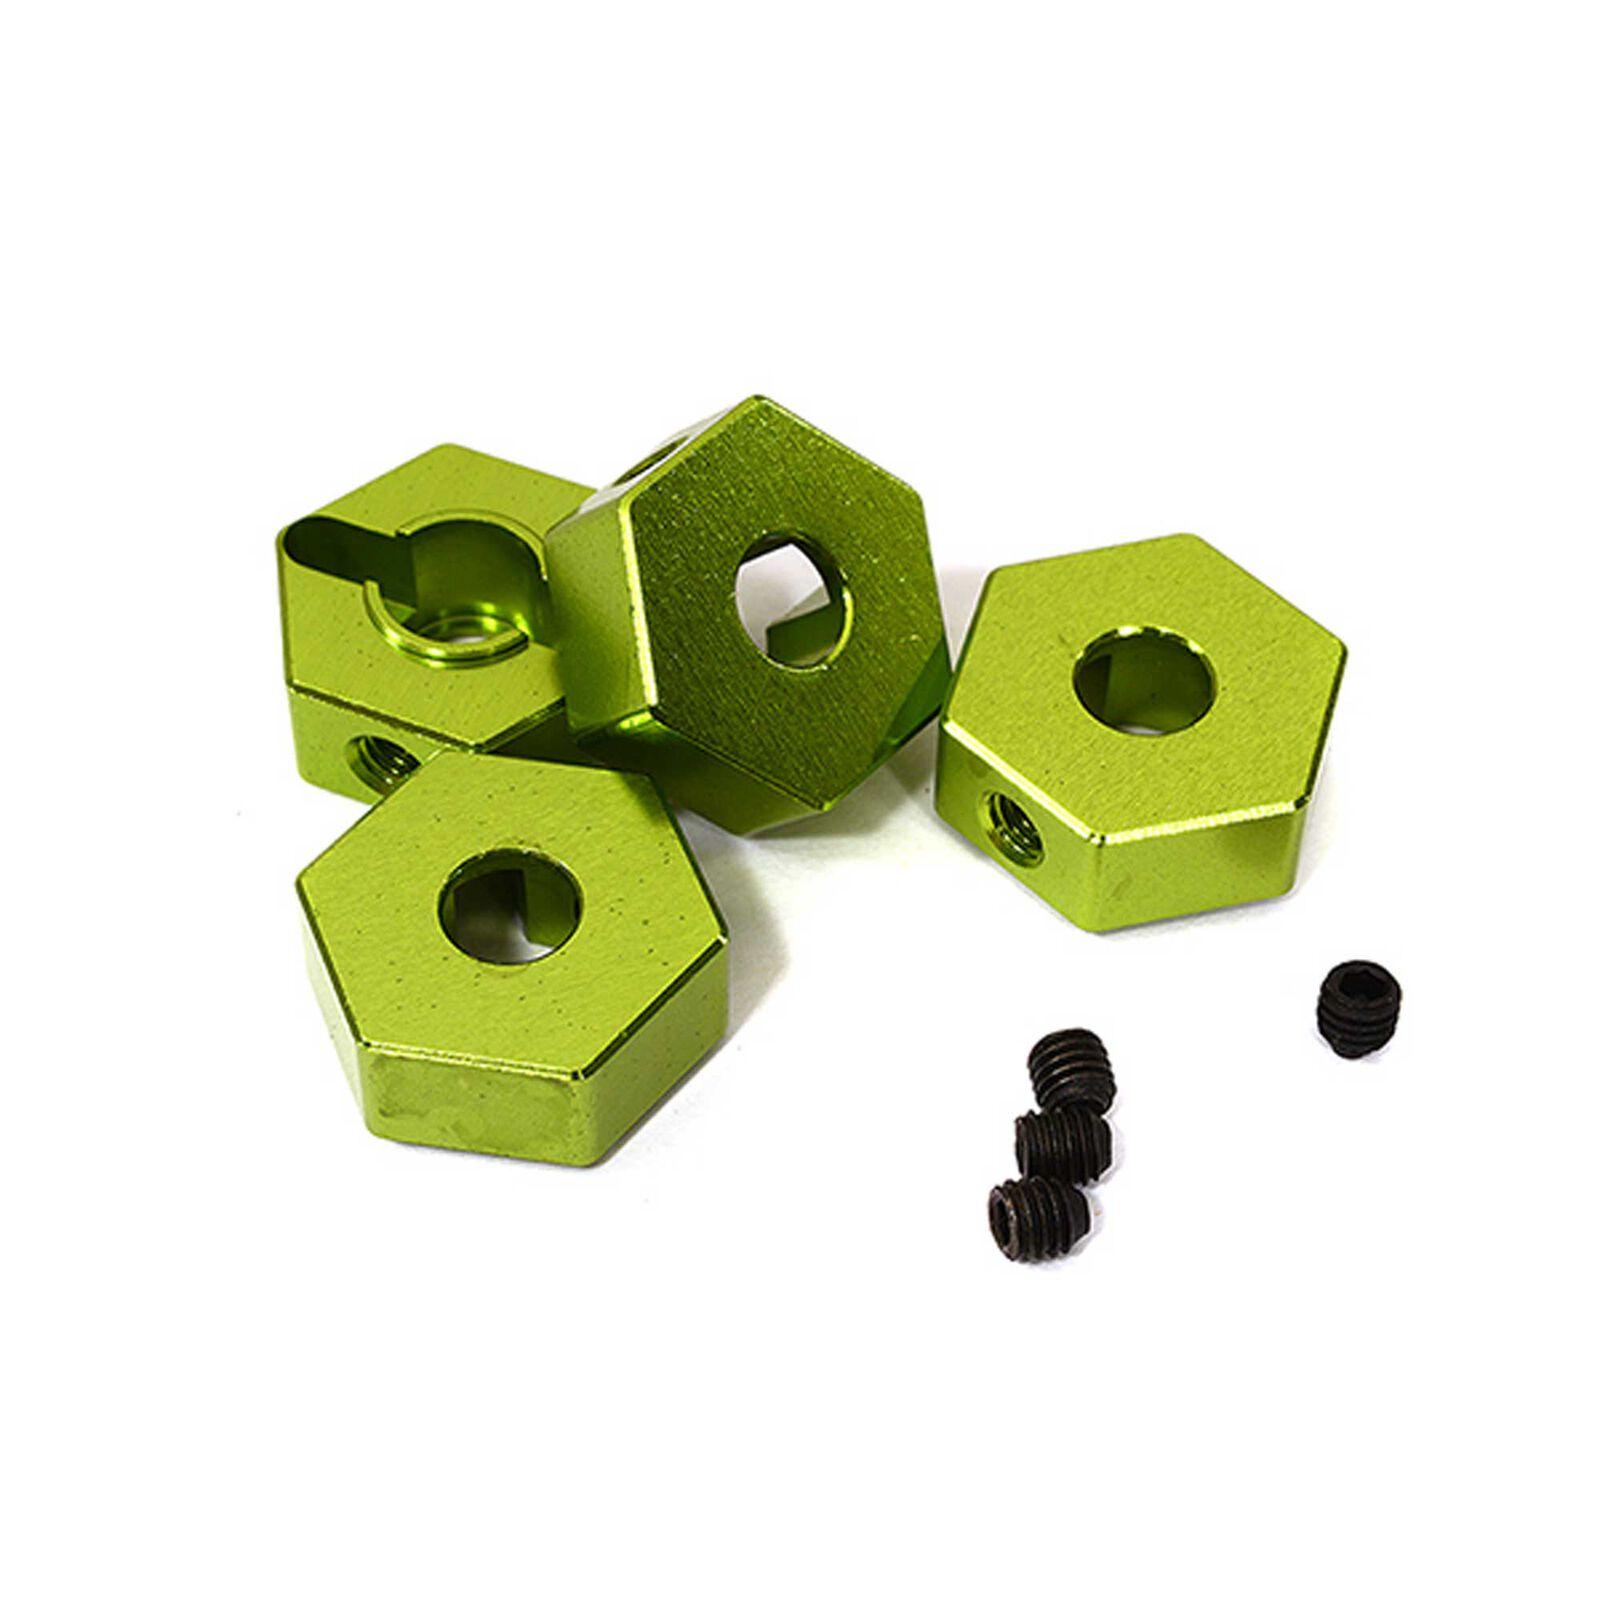 Wheel Hex, Green (4): ARRMA 1/10 GRANITE 4x4 3S BLX